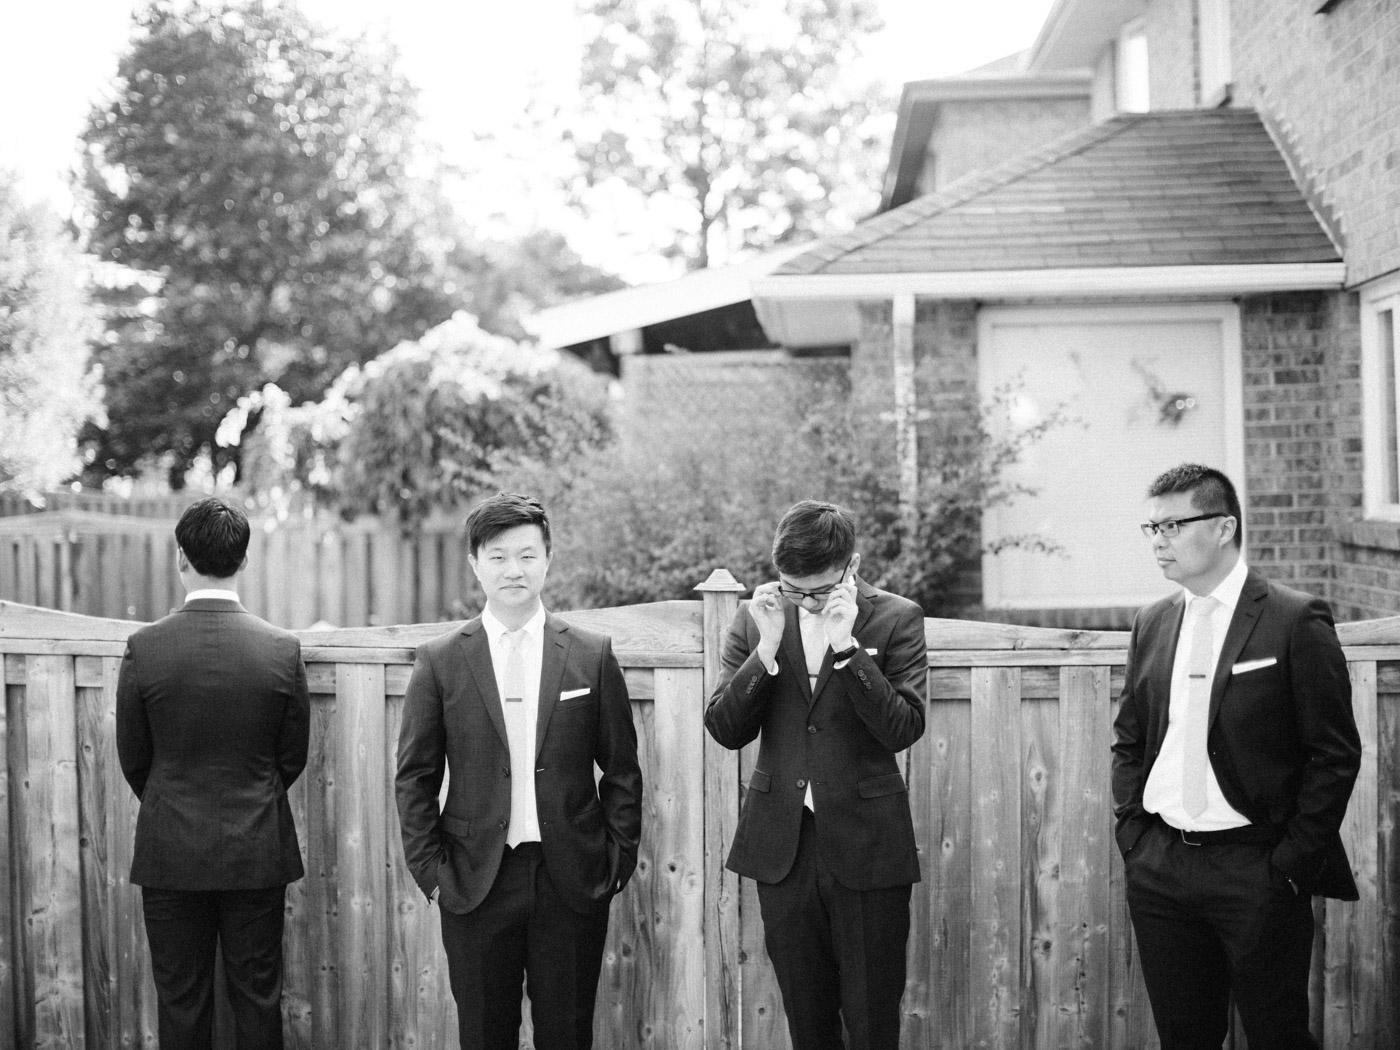 toronto_wedding_photographer_documentary_fine_art_photography-51.jpg